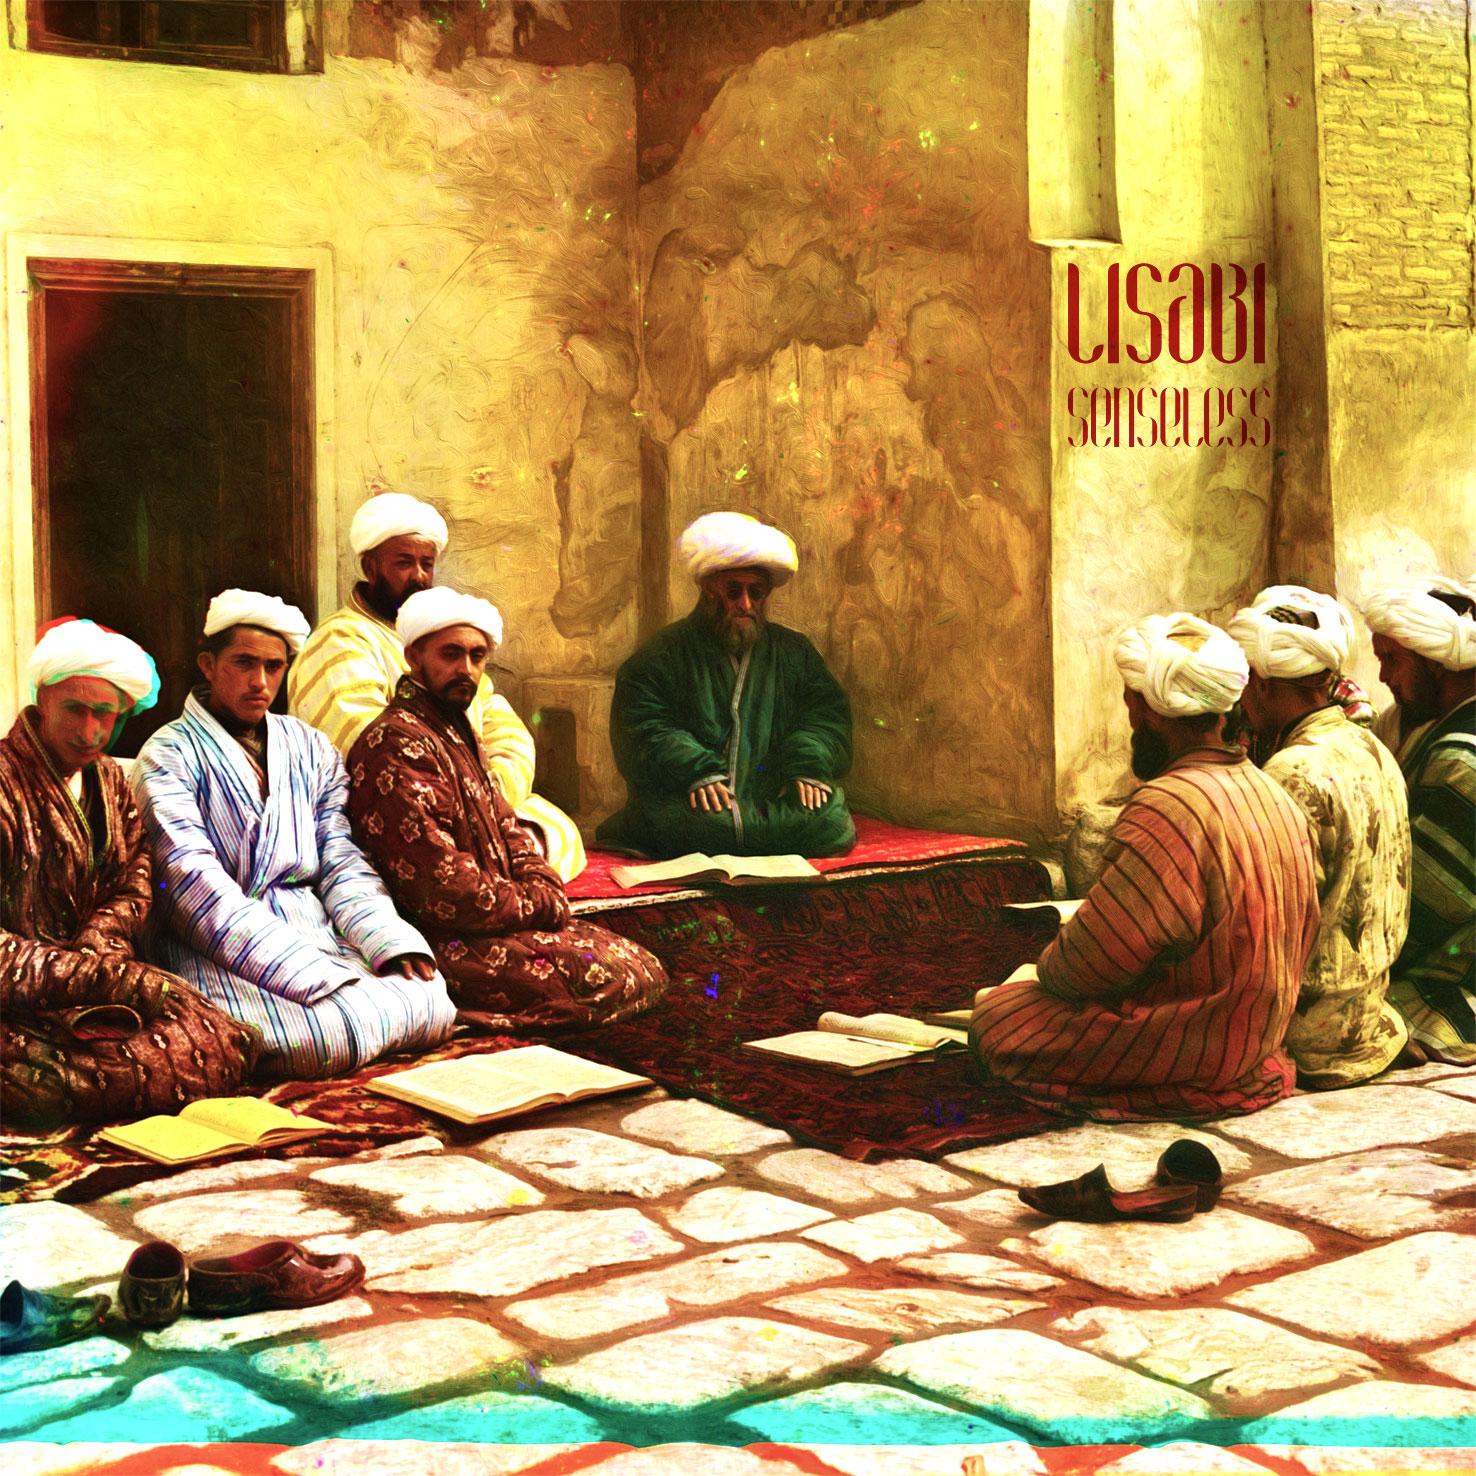 Lisabi - Senseless